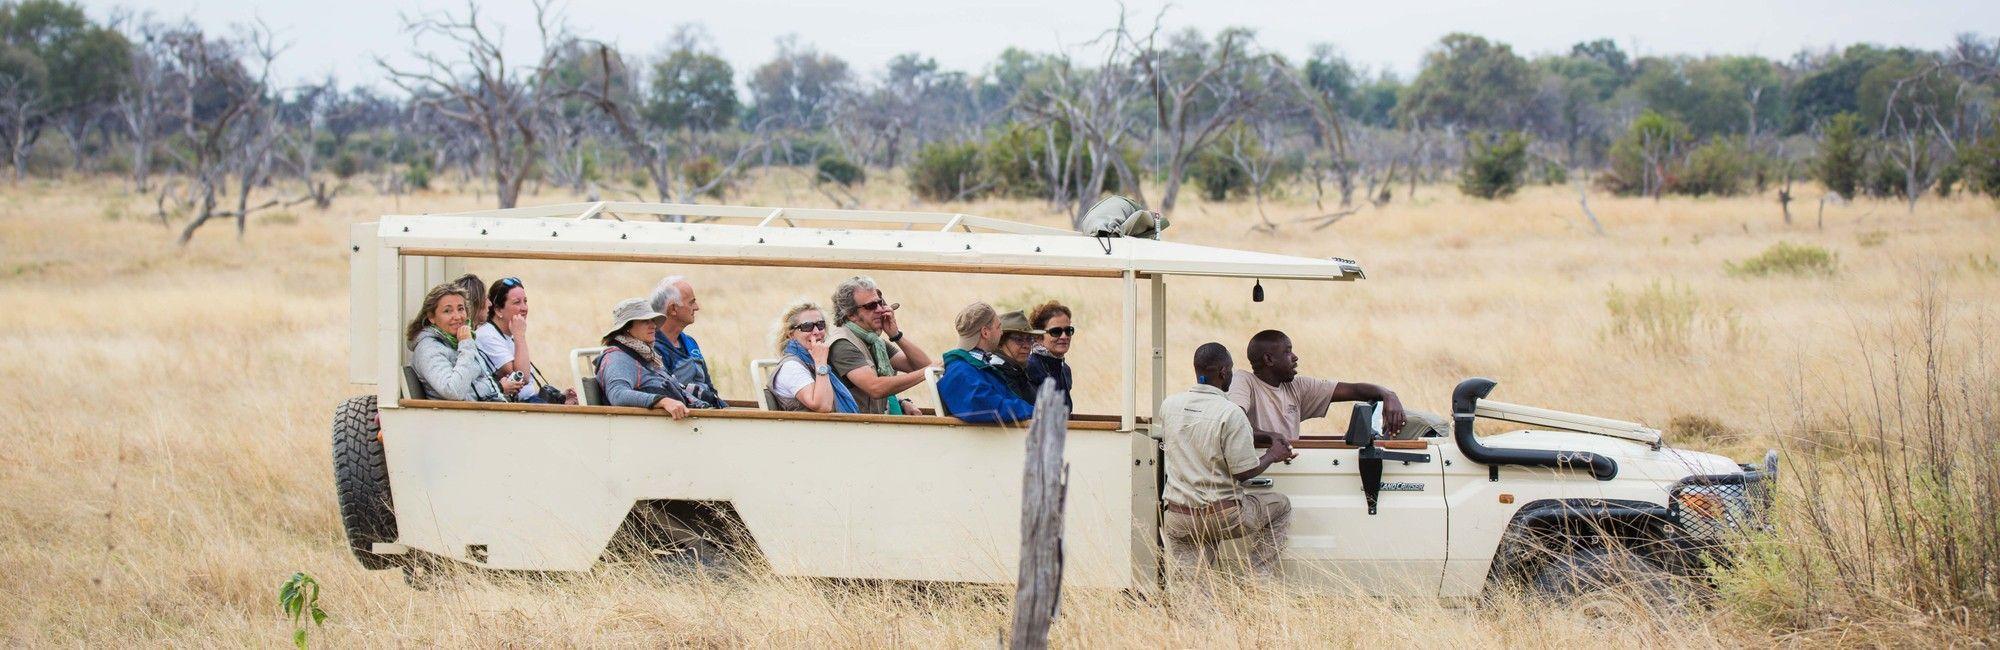 Kampeersafari Botswana Optimaal